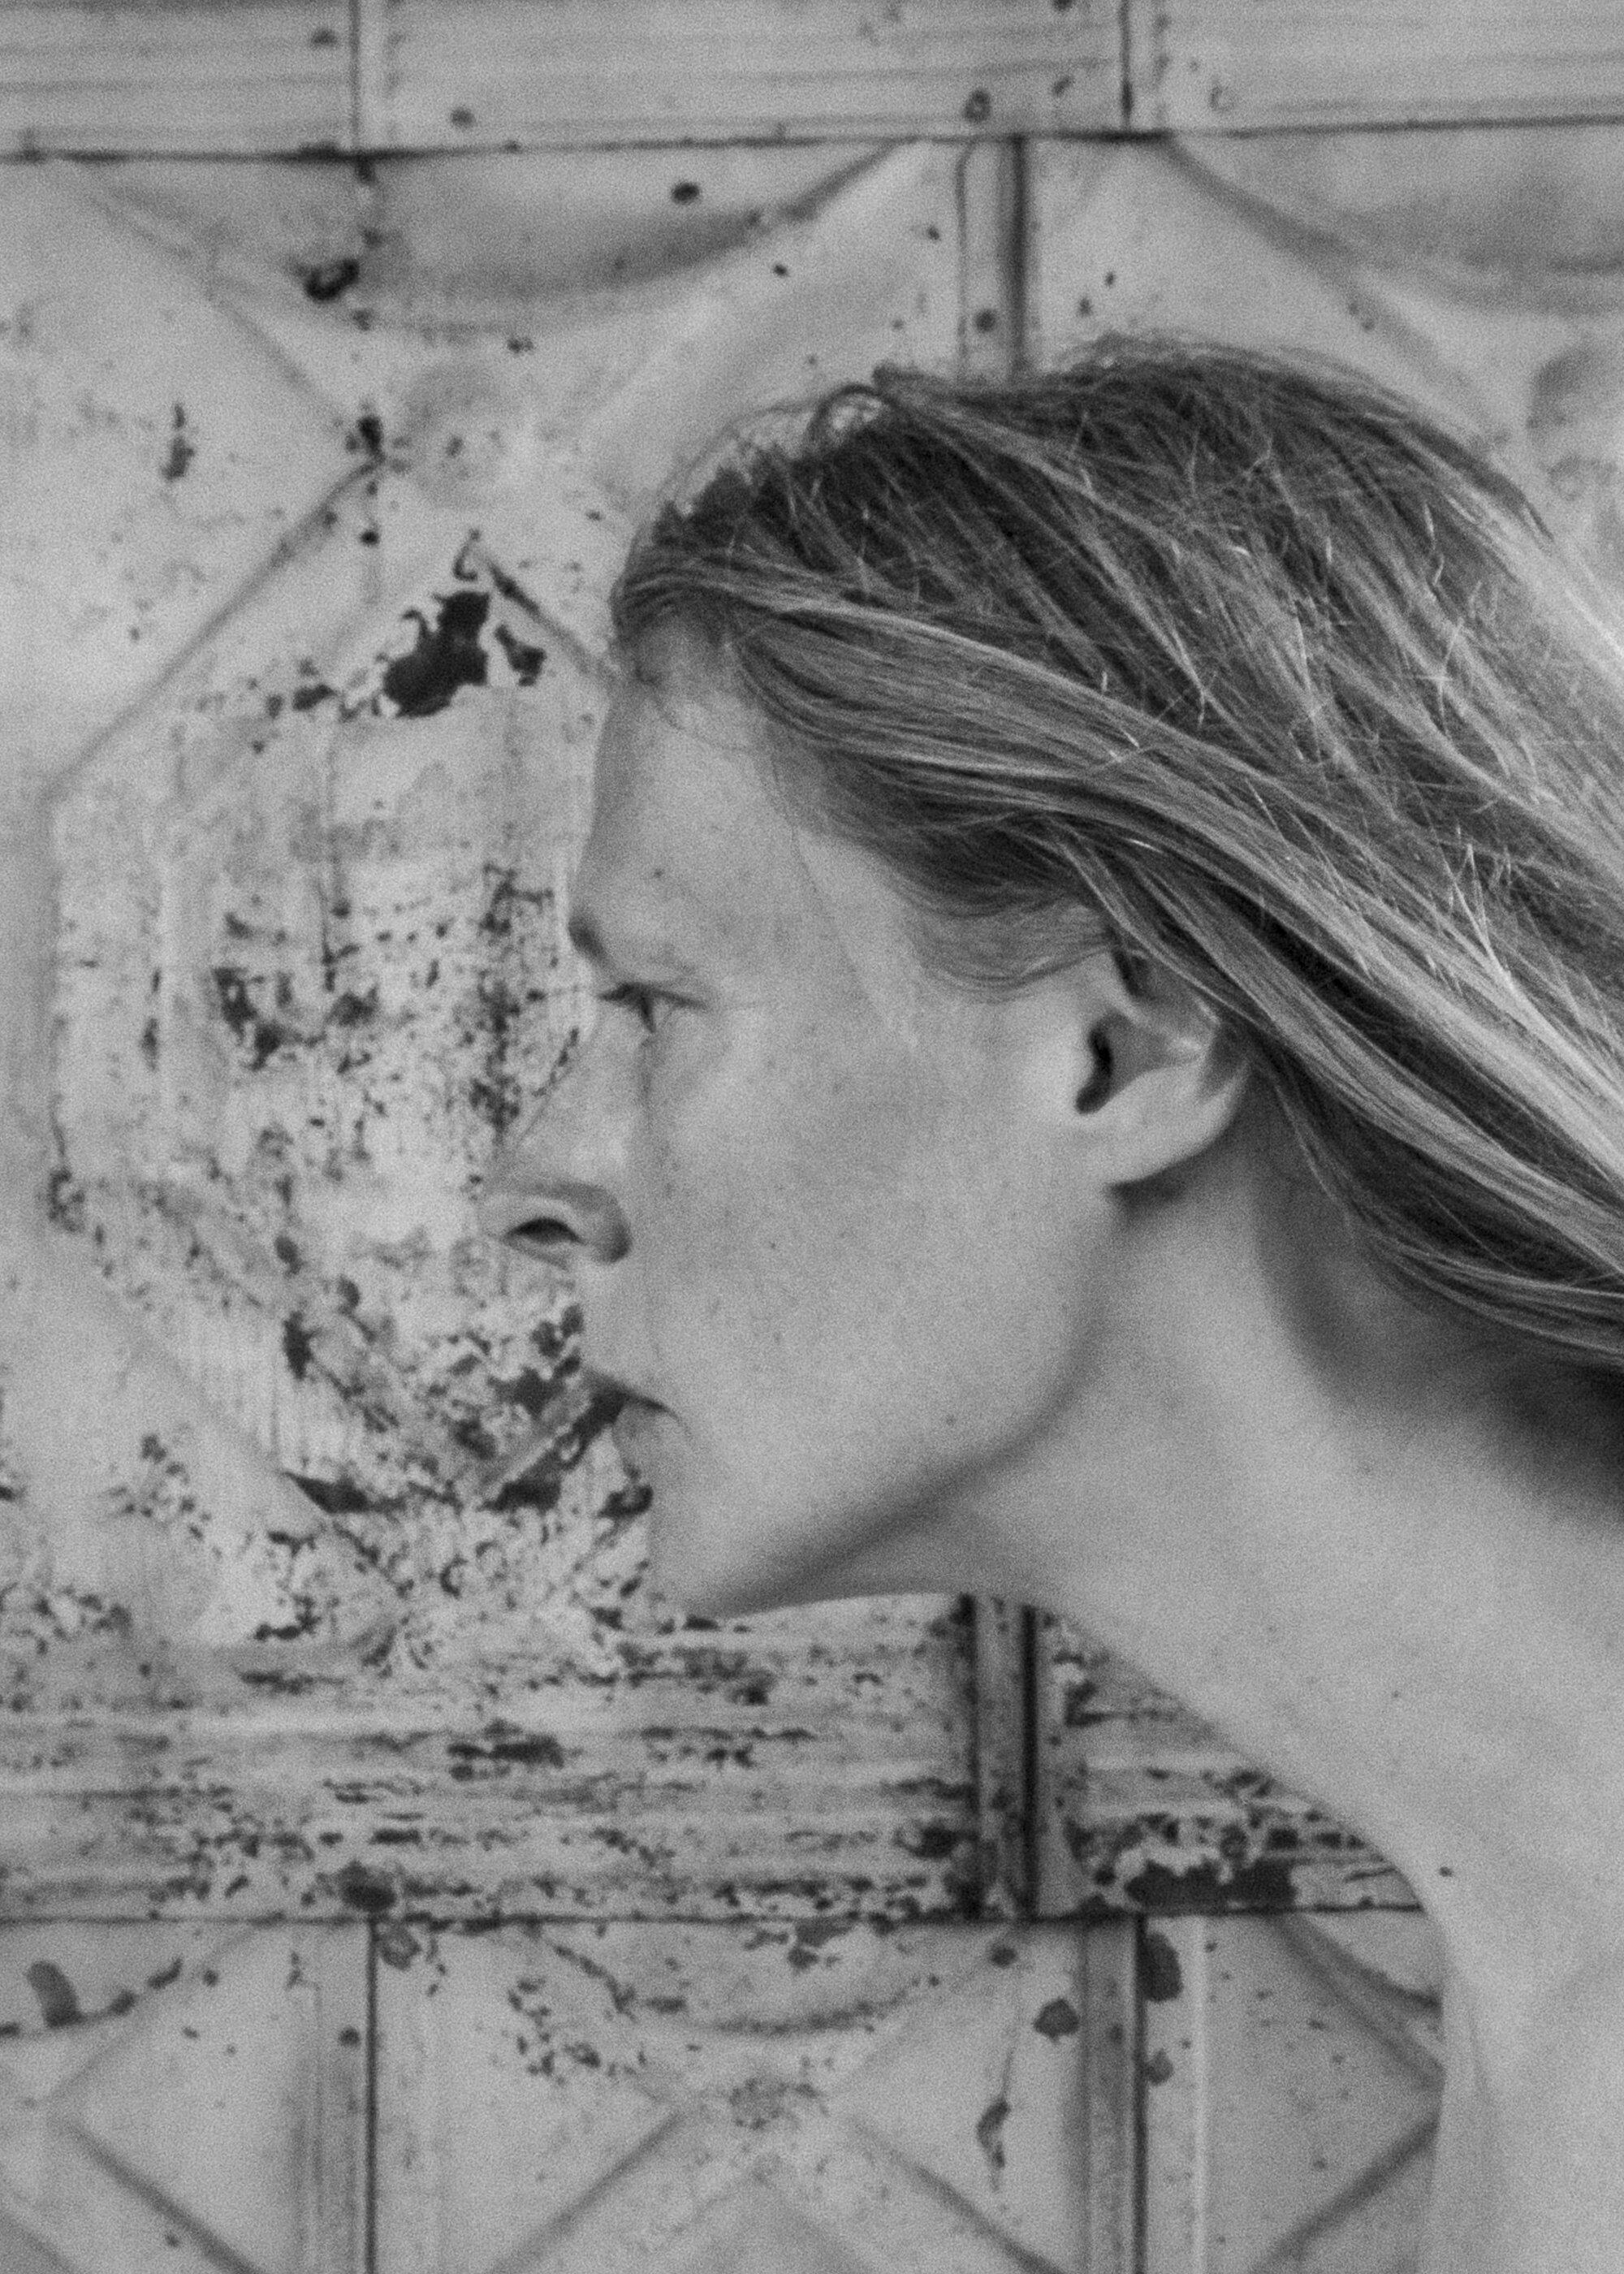 Laura-Morgan-Mark-Rabadan-Collection-Issue 4.jpg